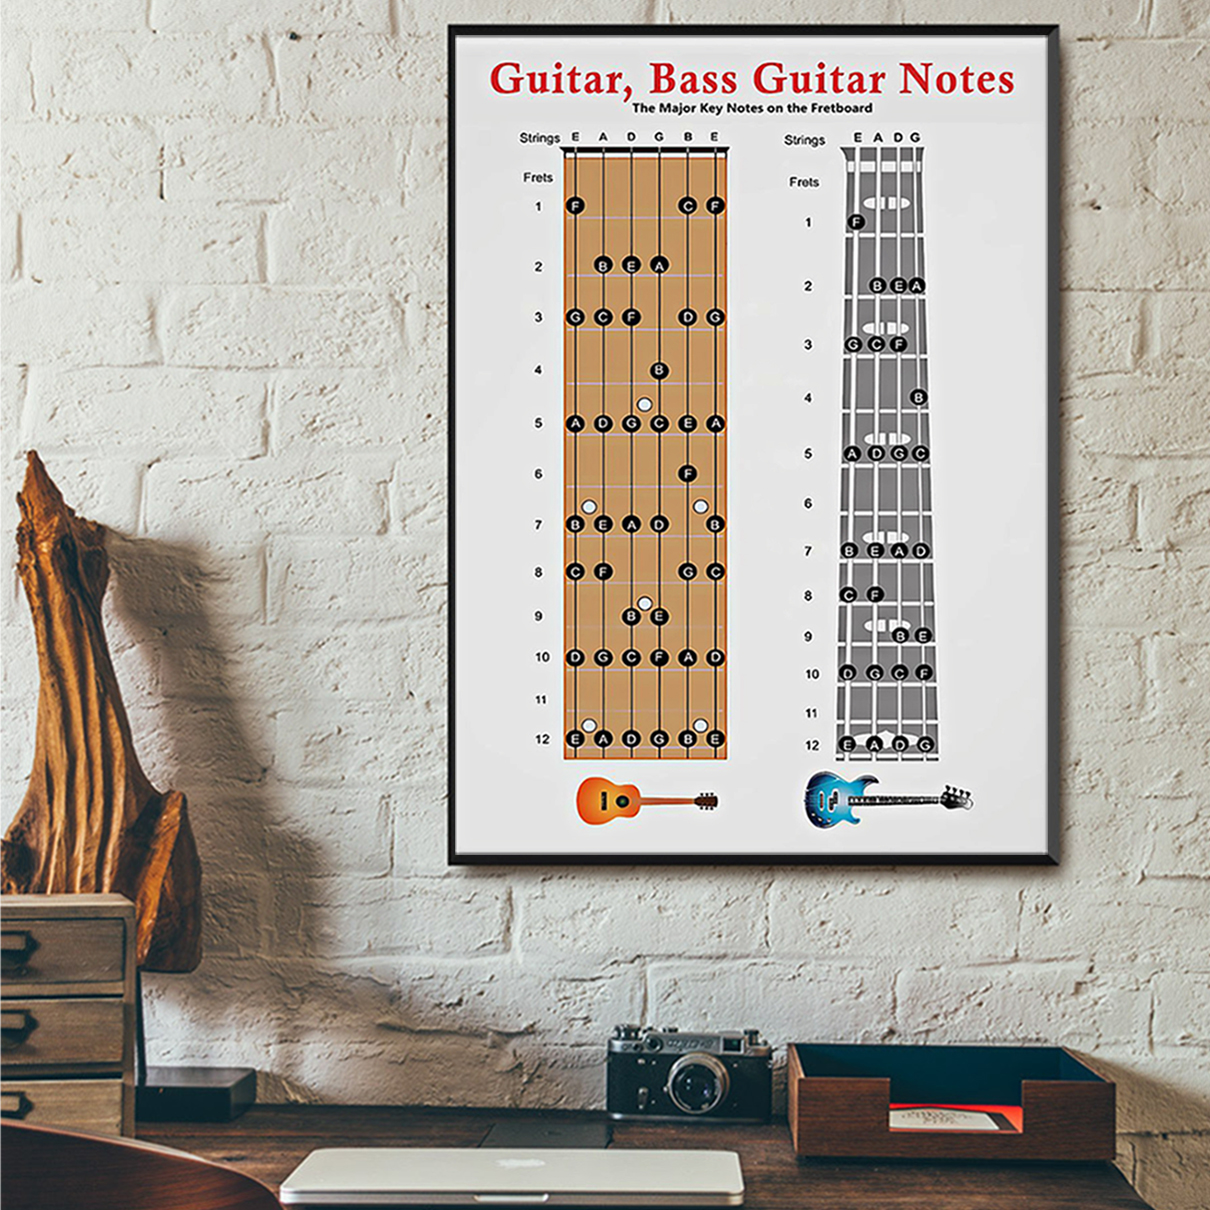 Guitar and bass guitar notes poster A1